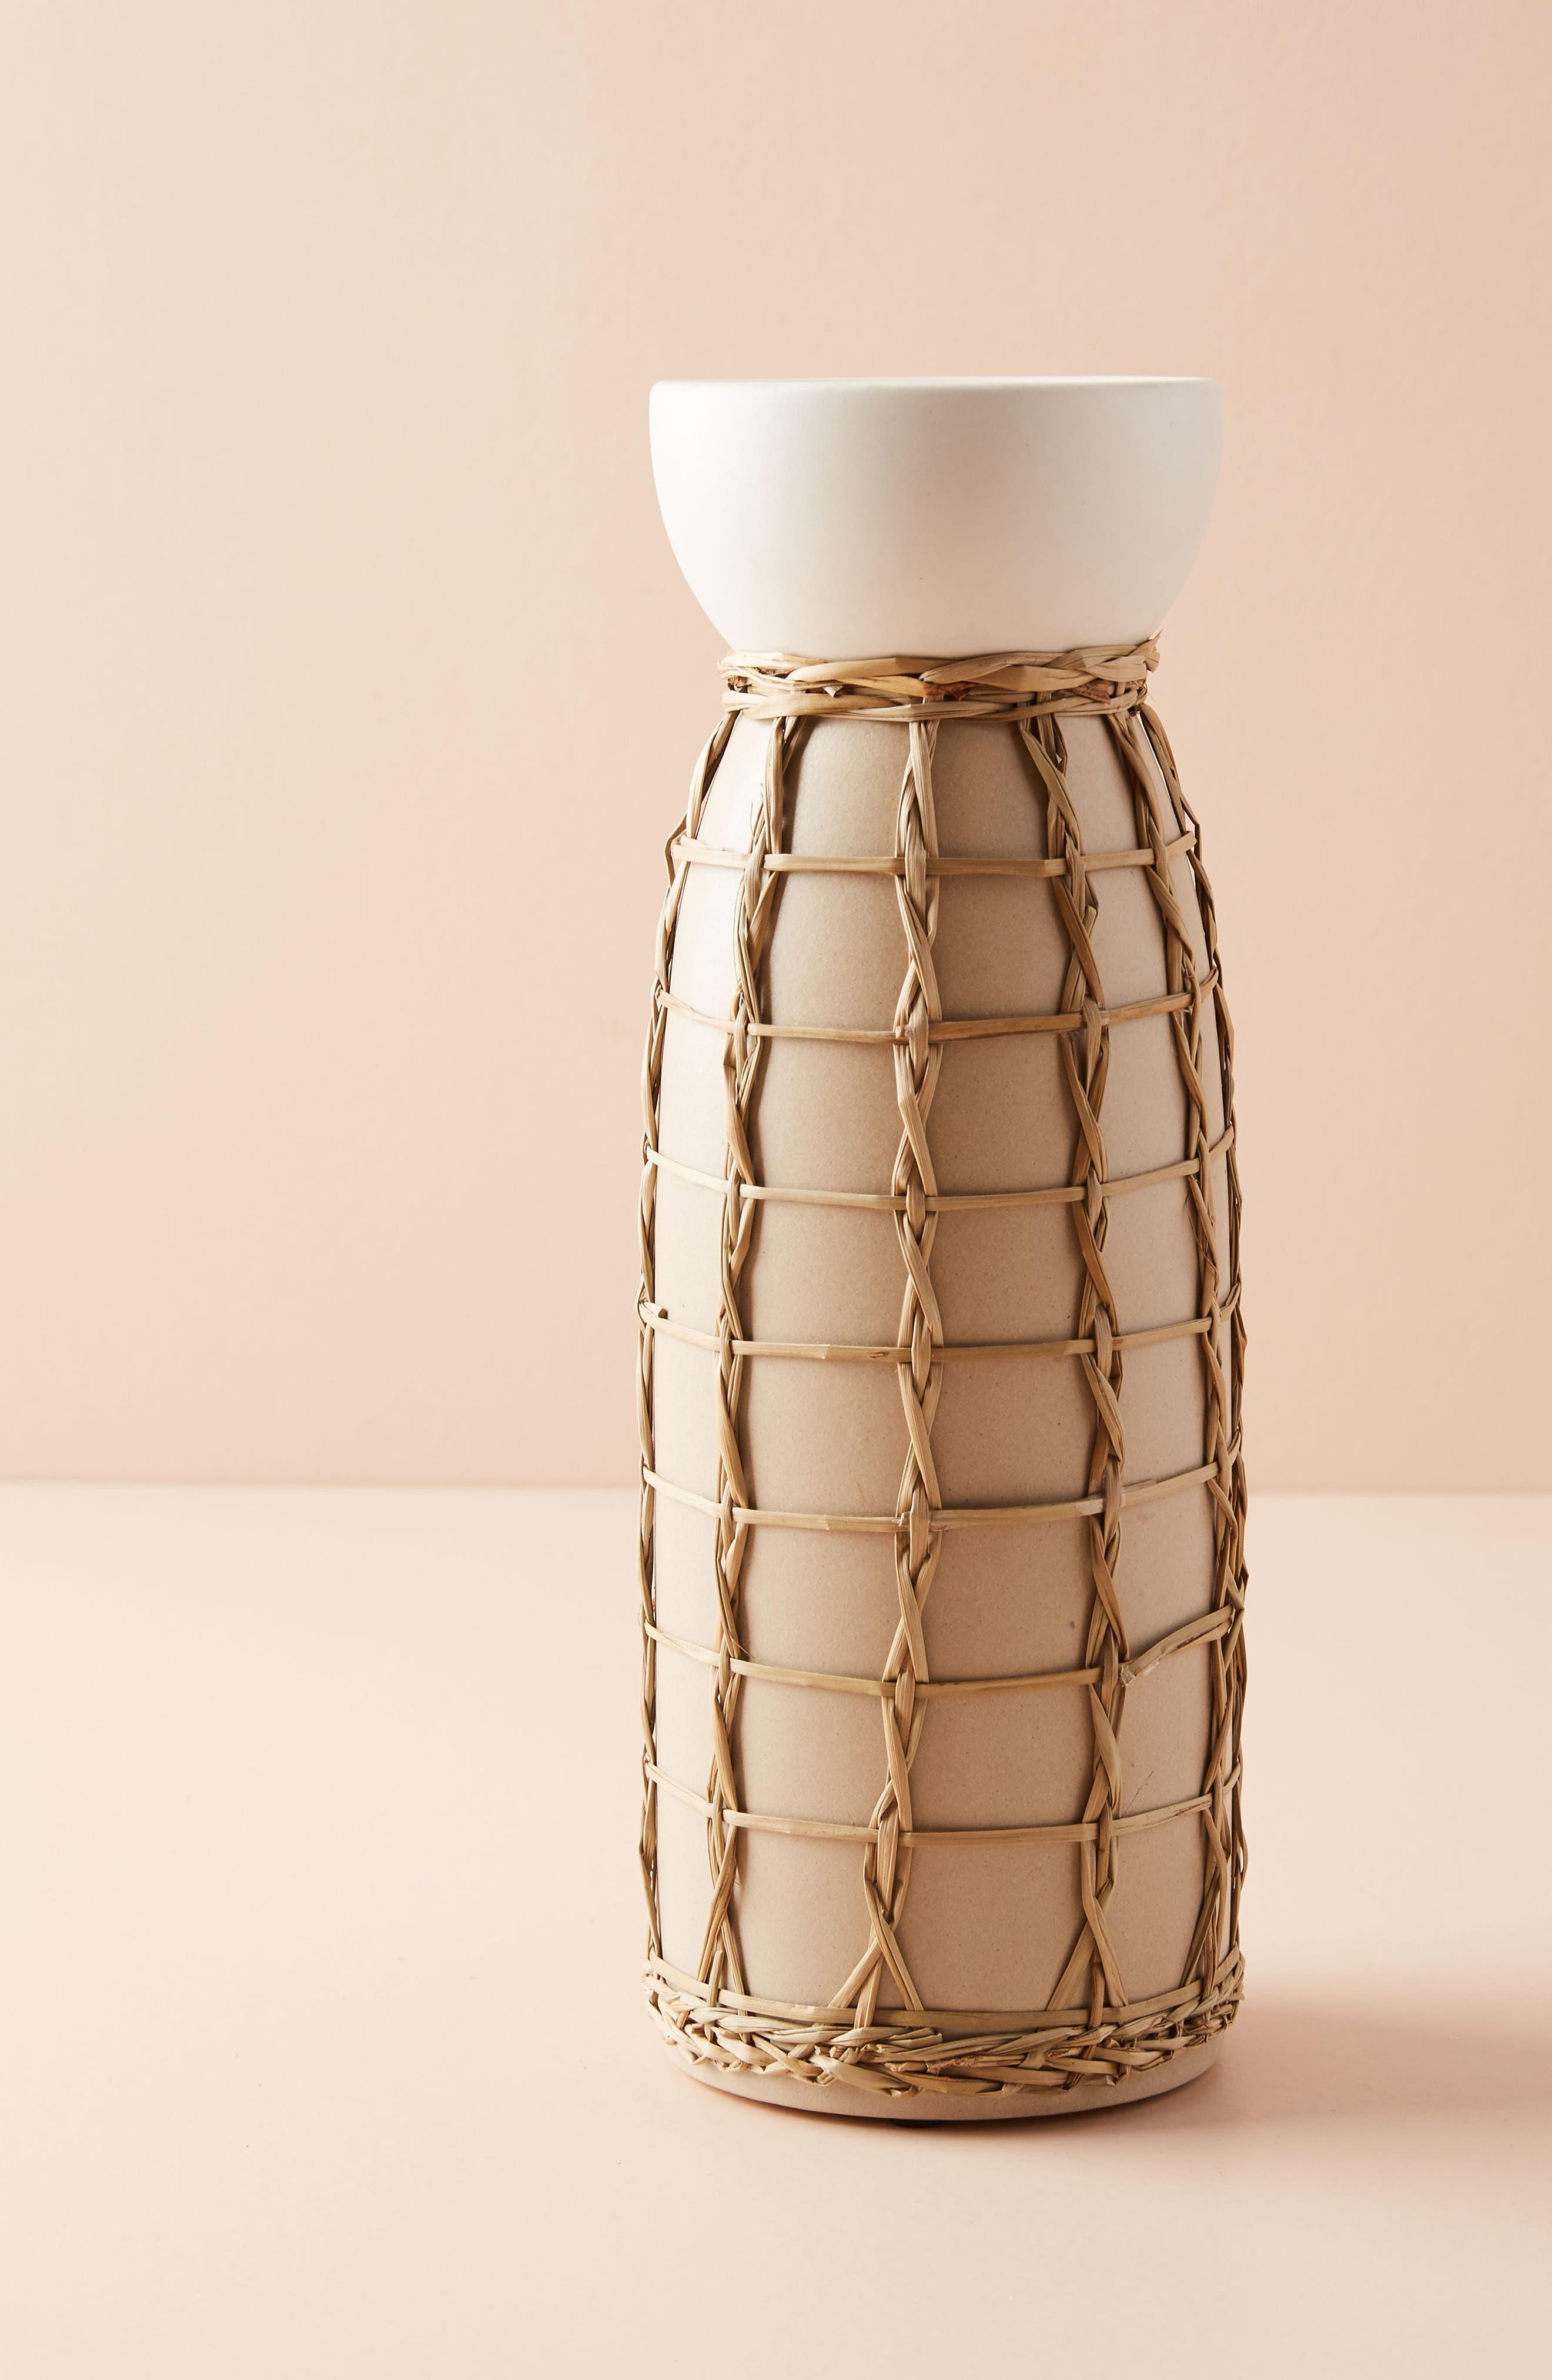 Wicker Pillar Candleholder,                             Main thumbnail 1, color,                             Cream - Large